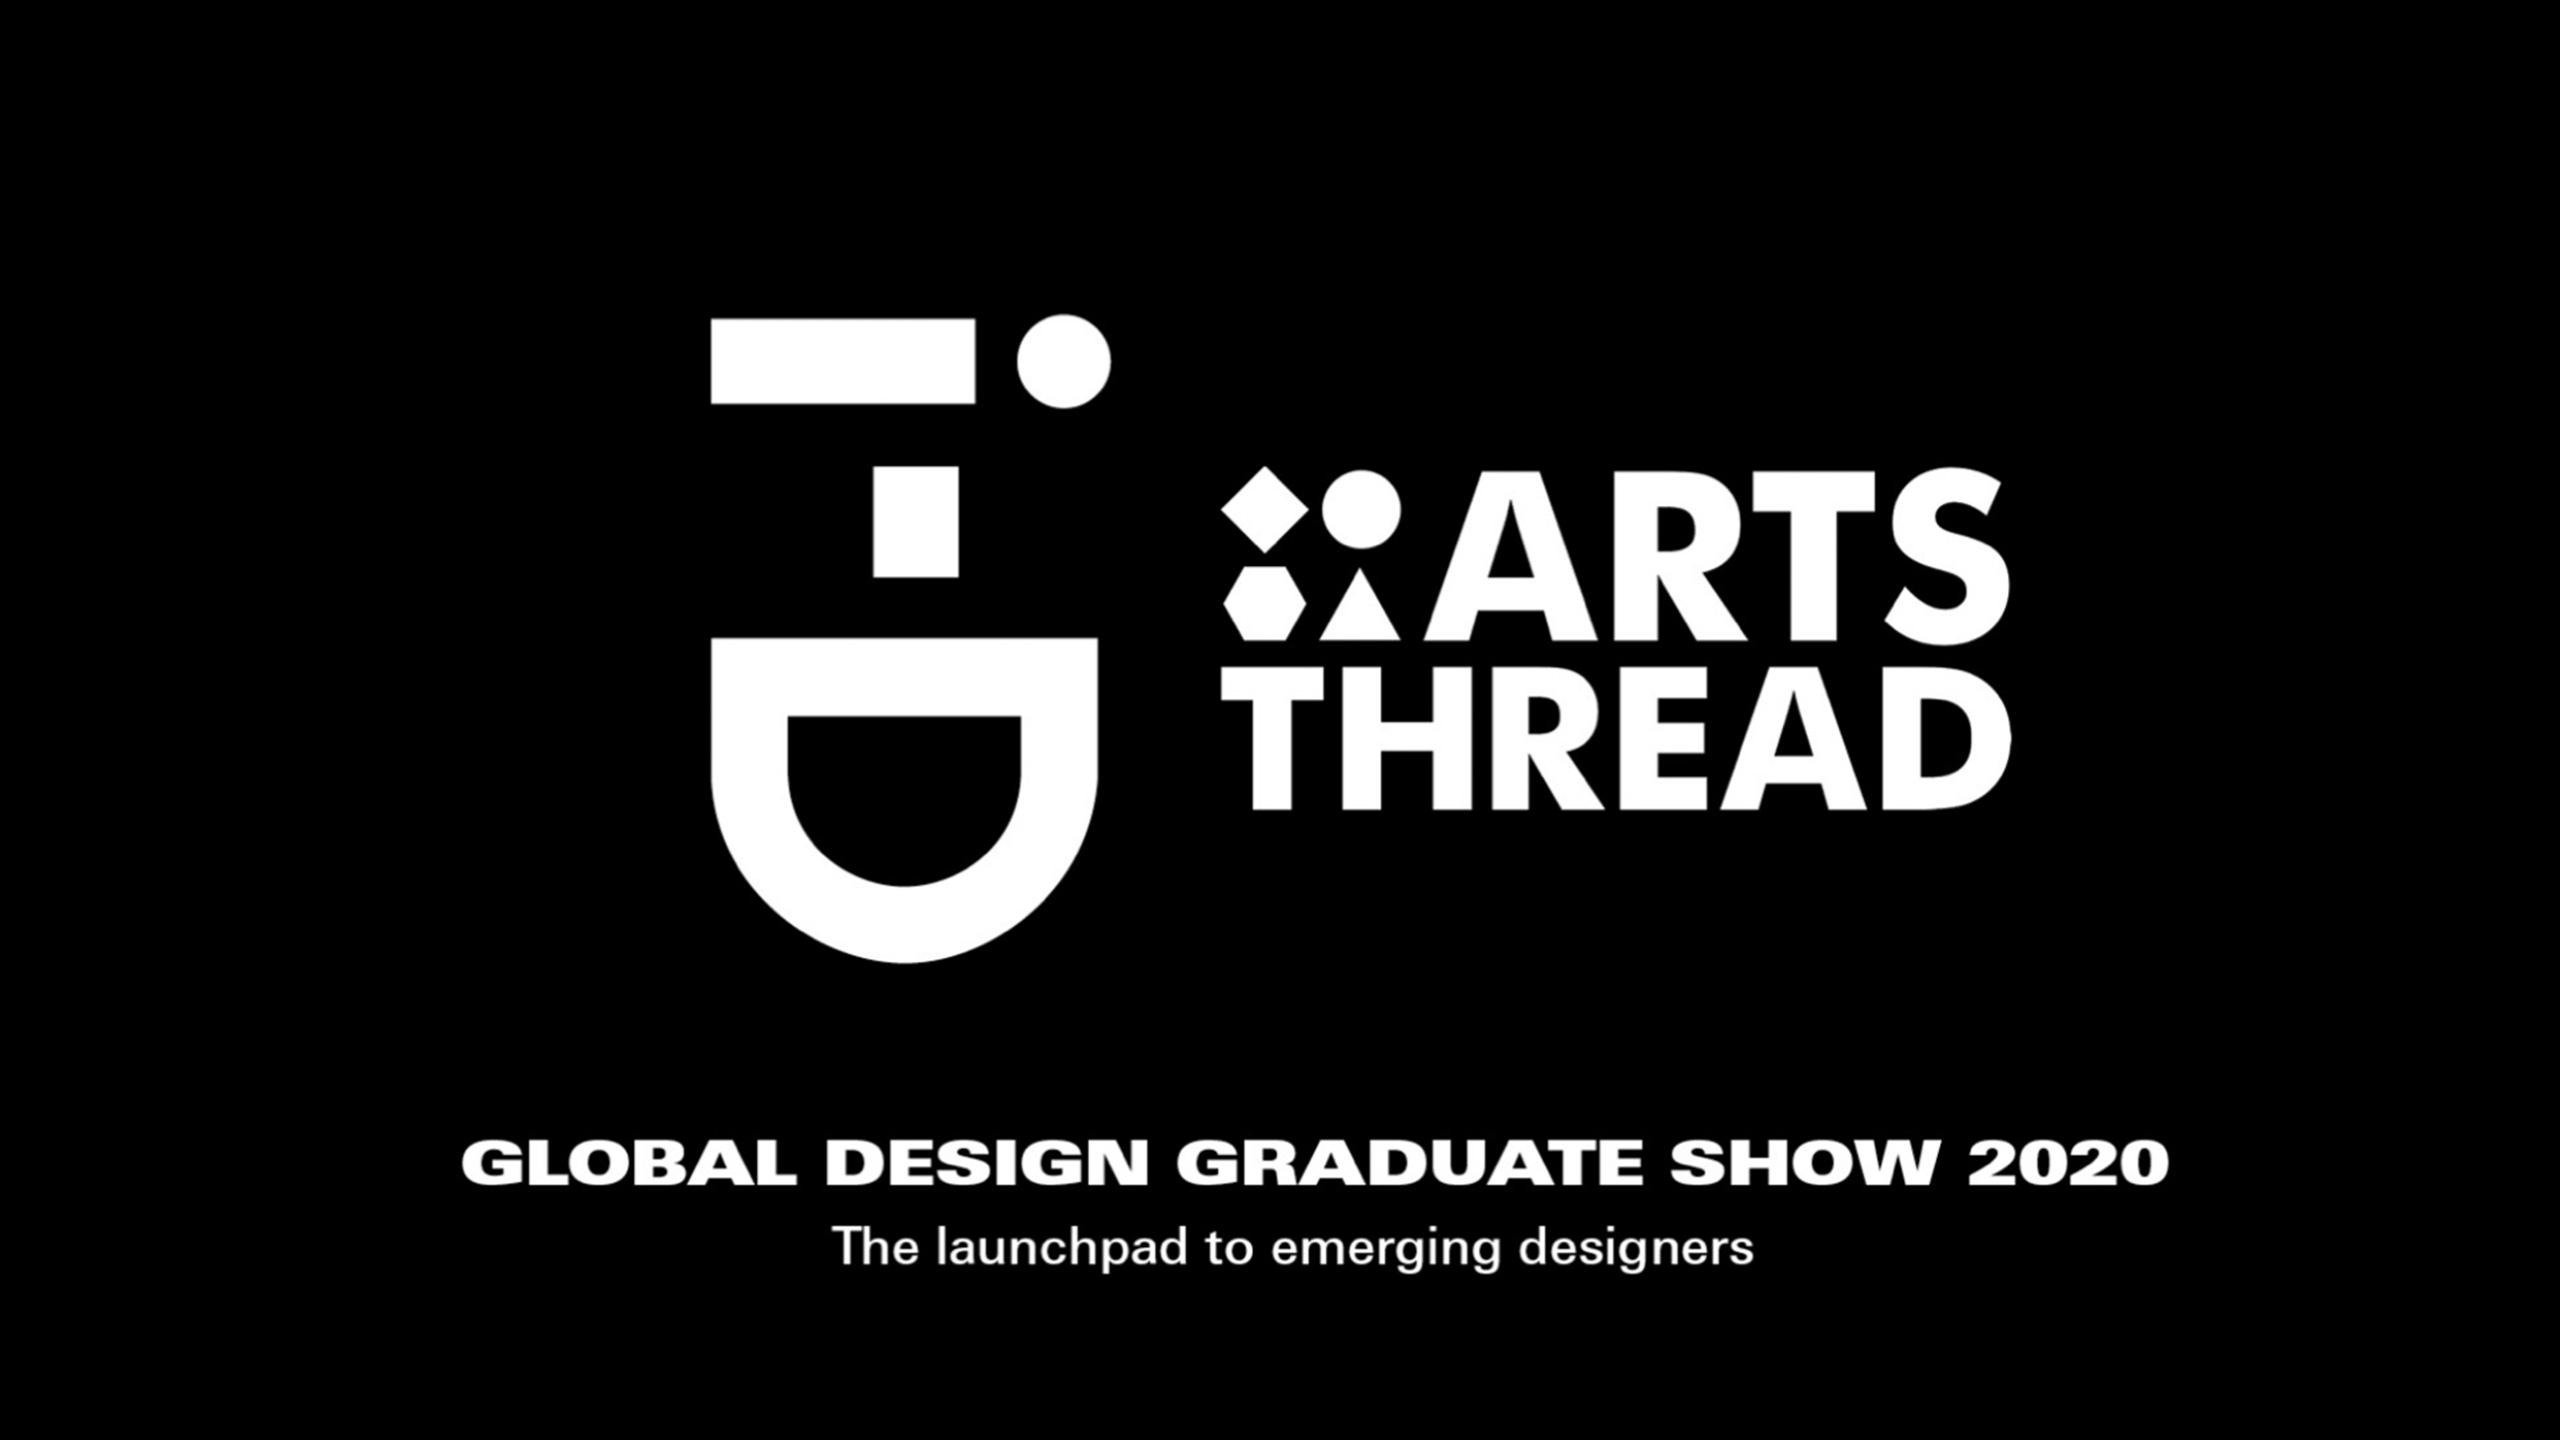 Artsthread Global Design Graduate Awards 2020